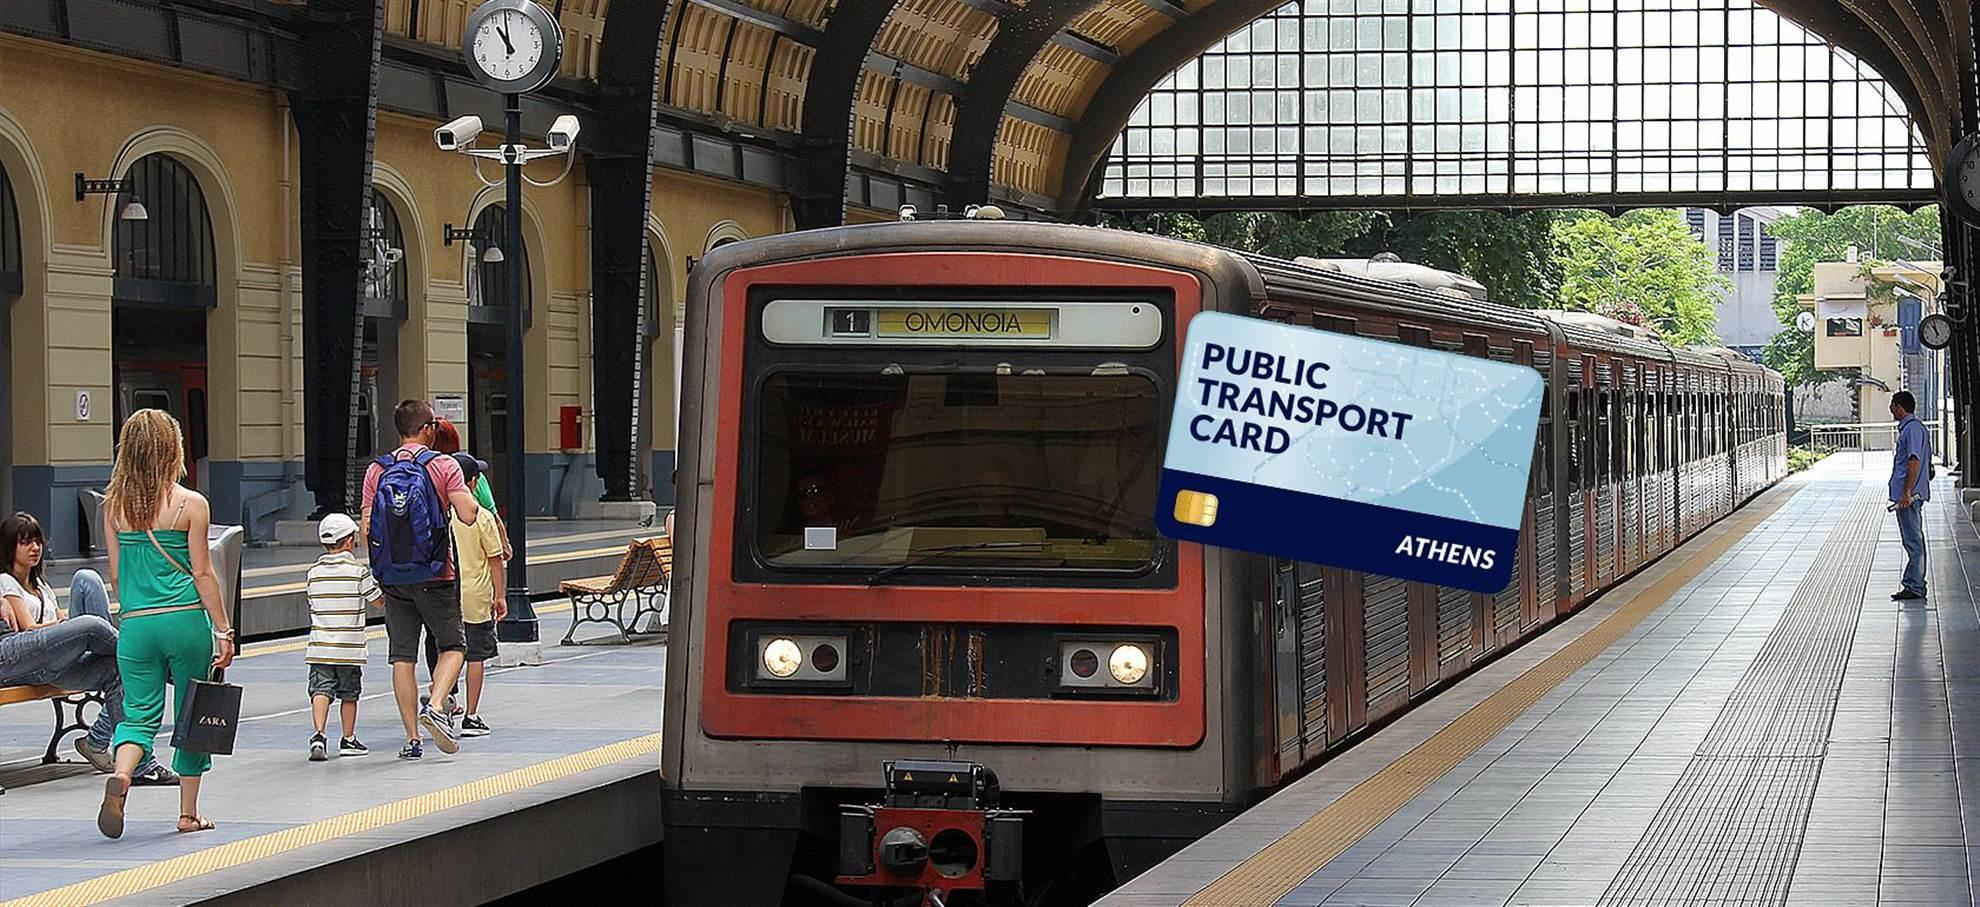 Atene Travel Card